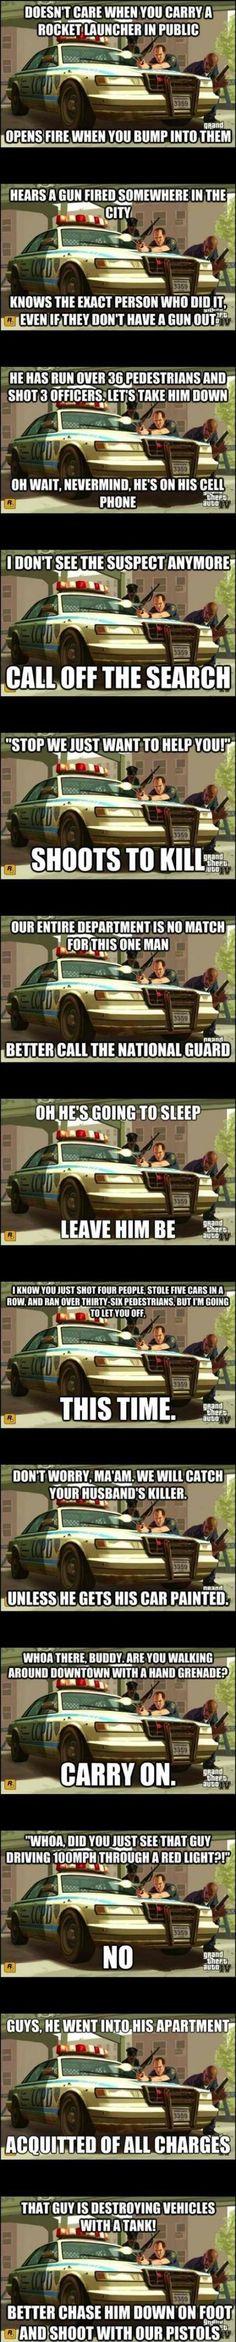 GTA logic.